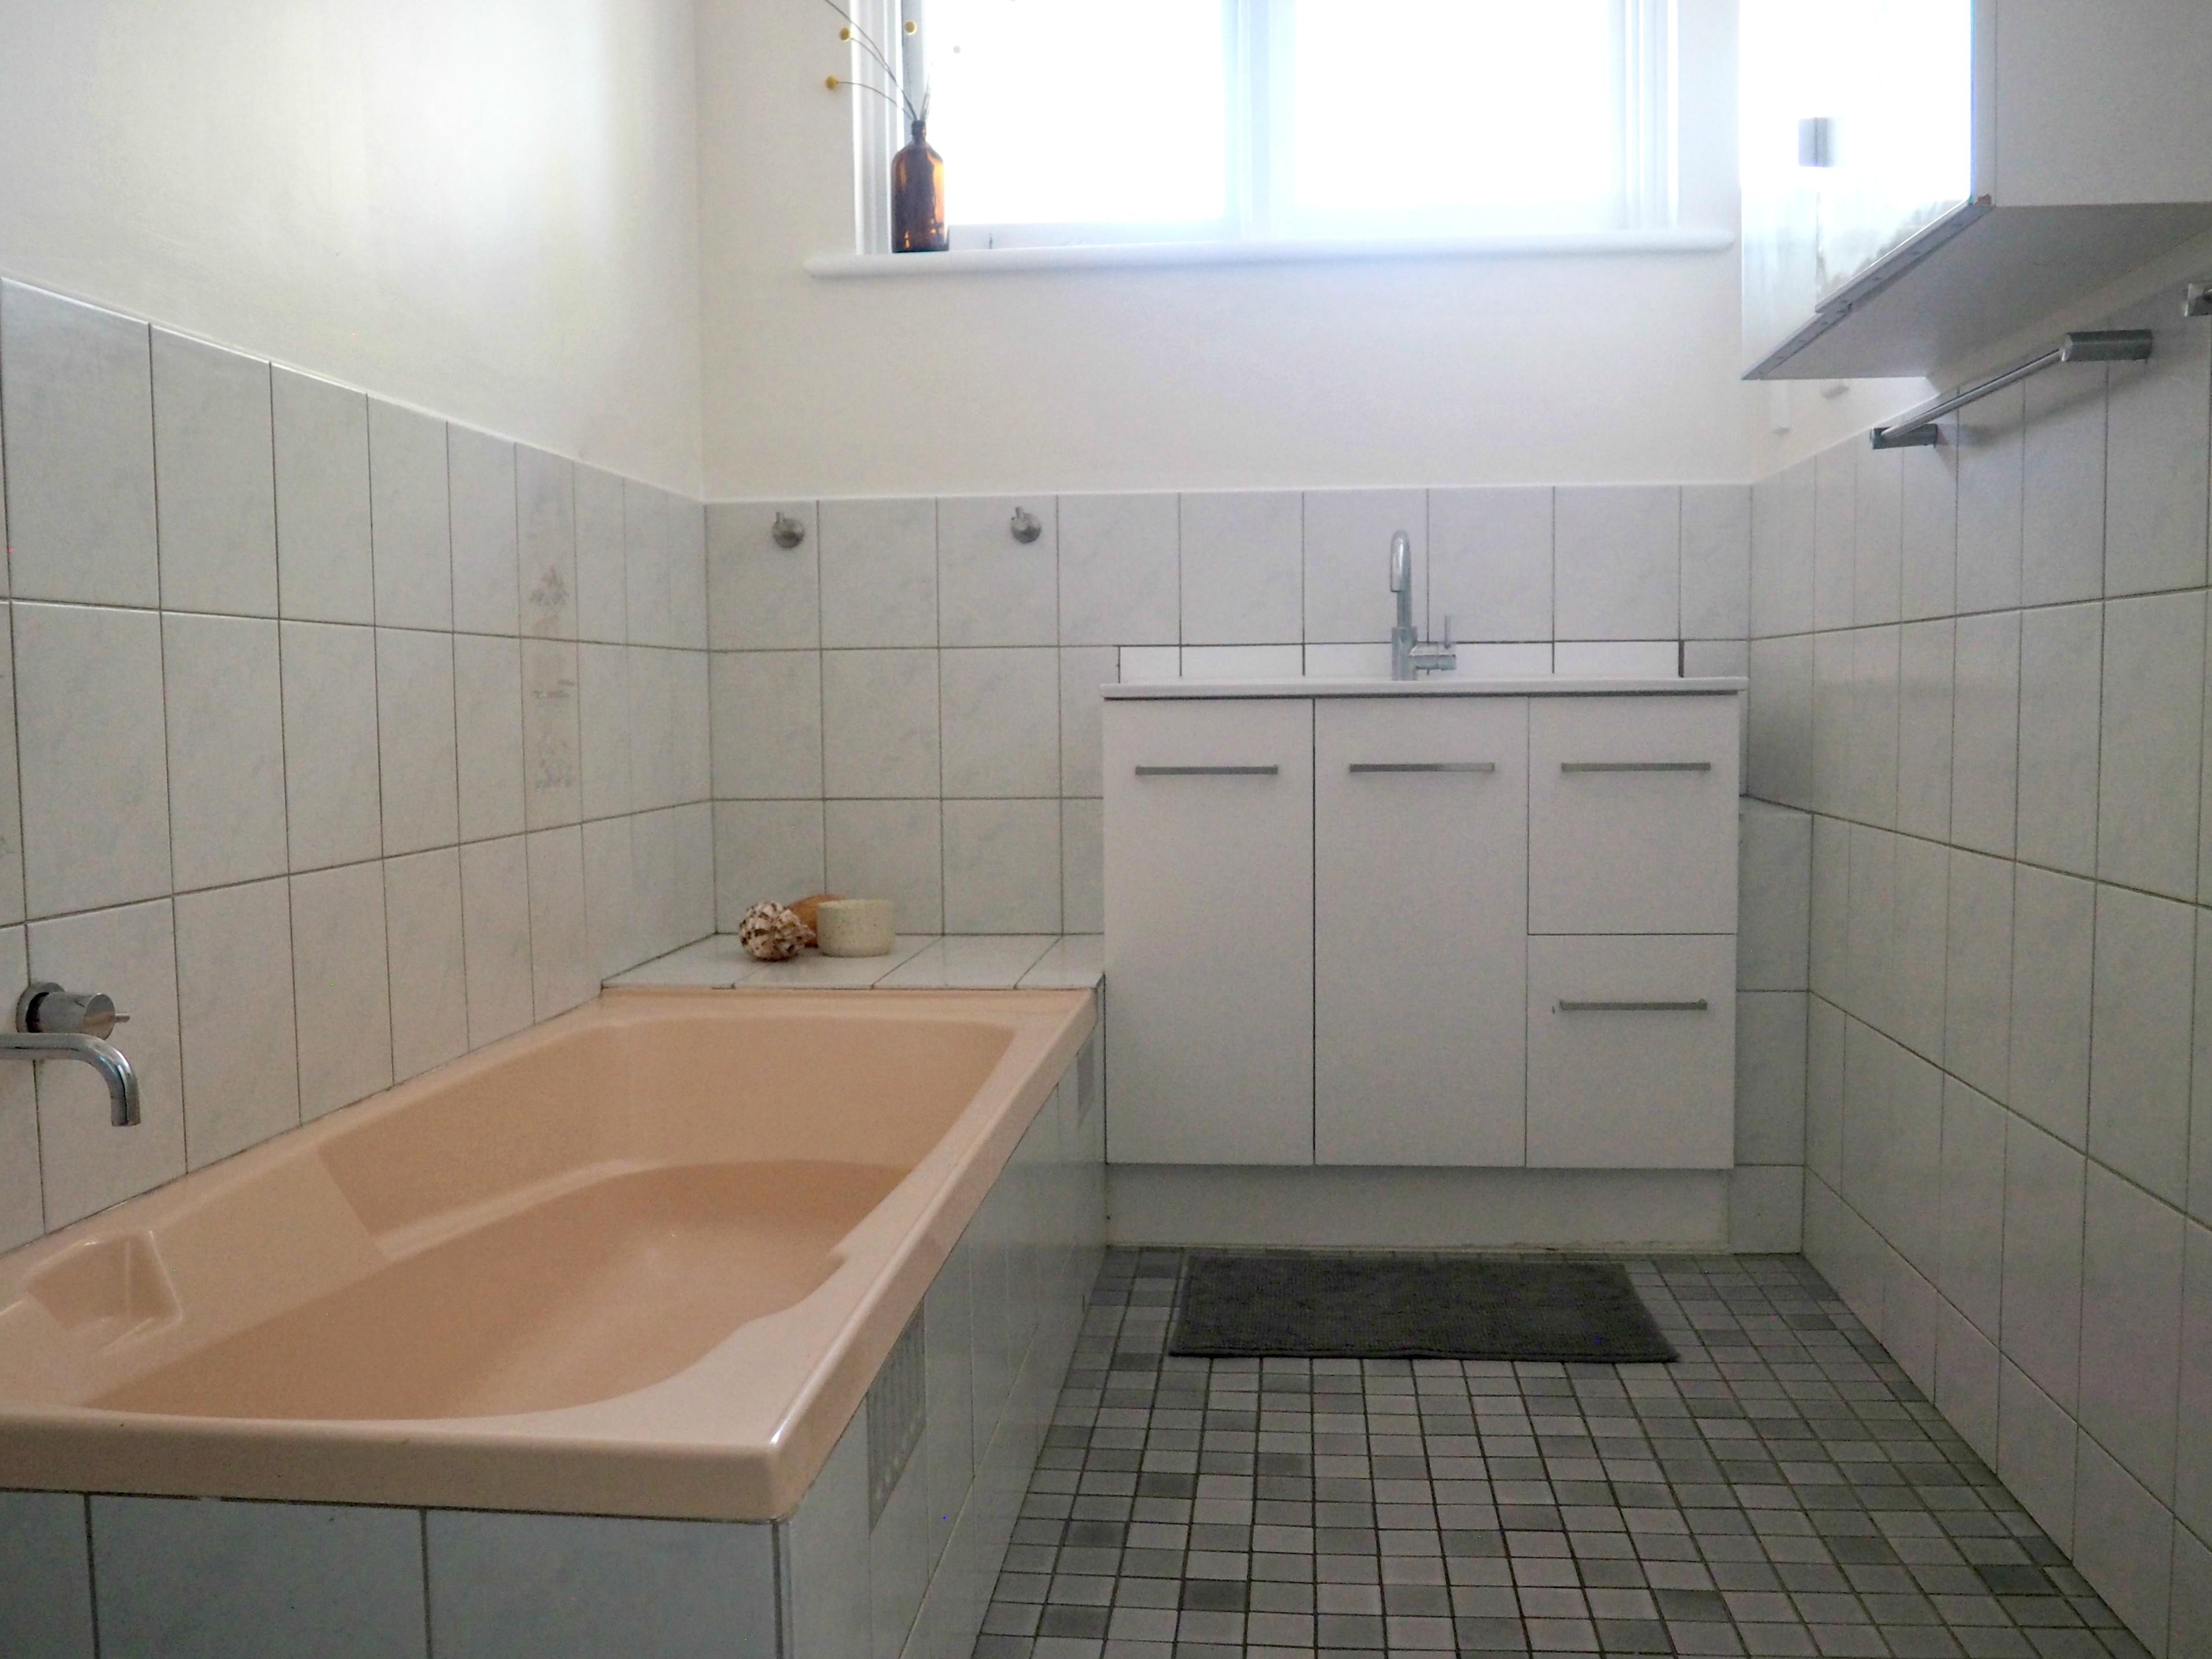 mydimport-1596538631-hires.5459-Bathroom.JPG